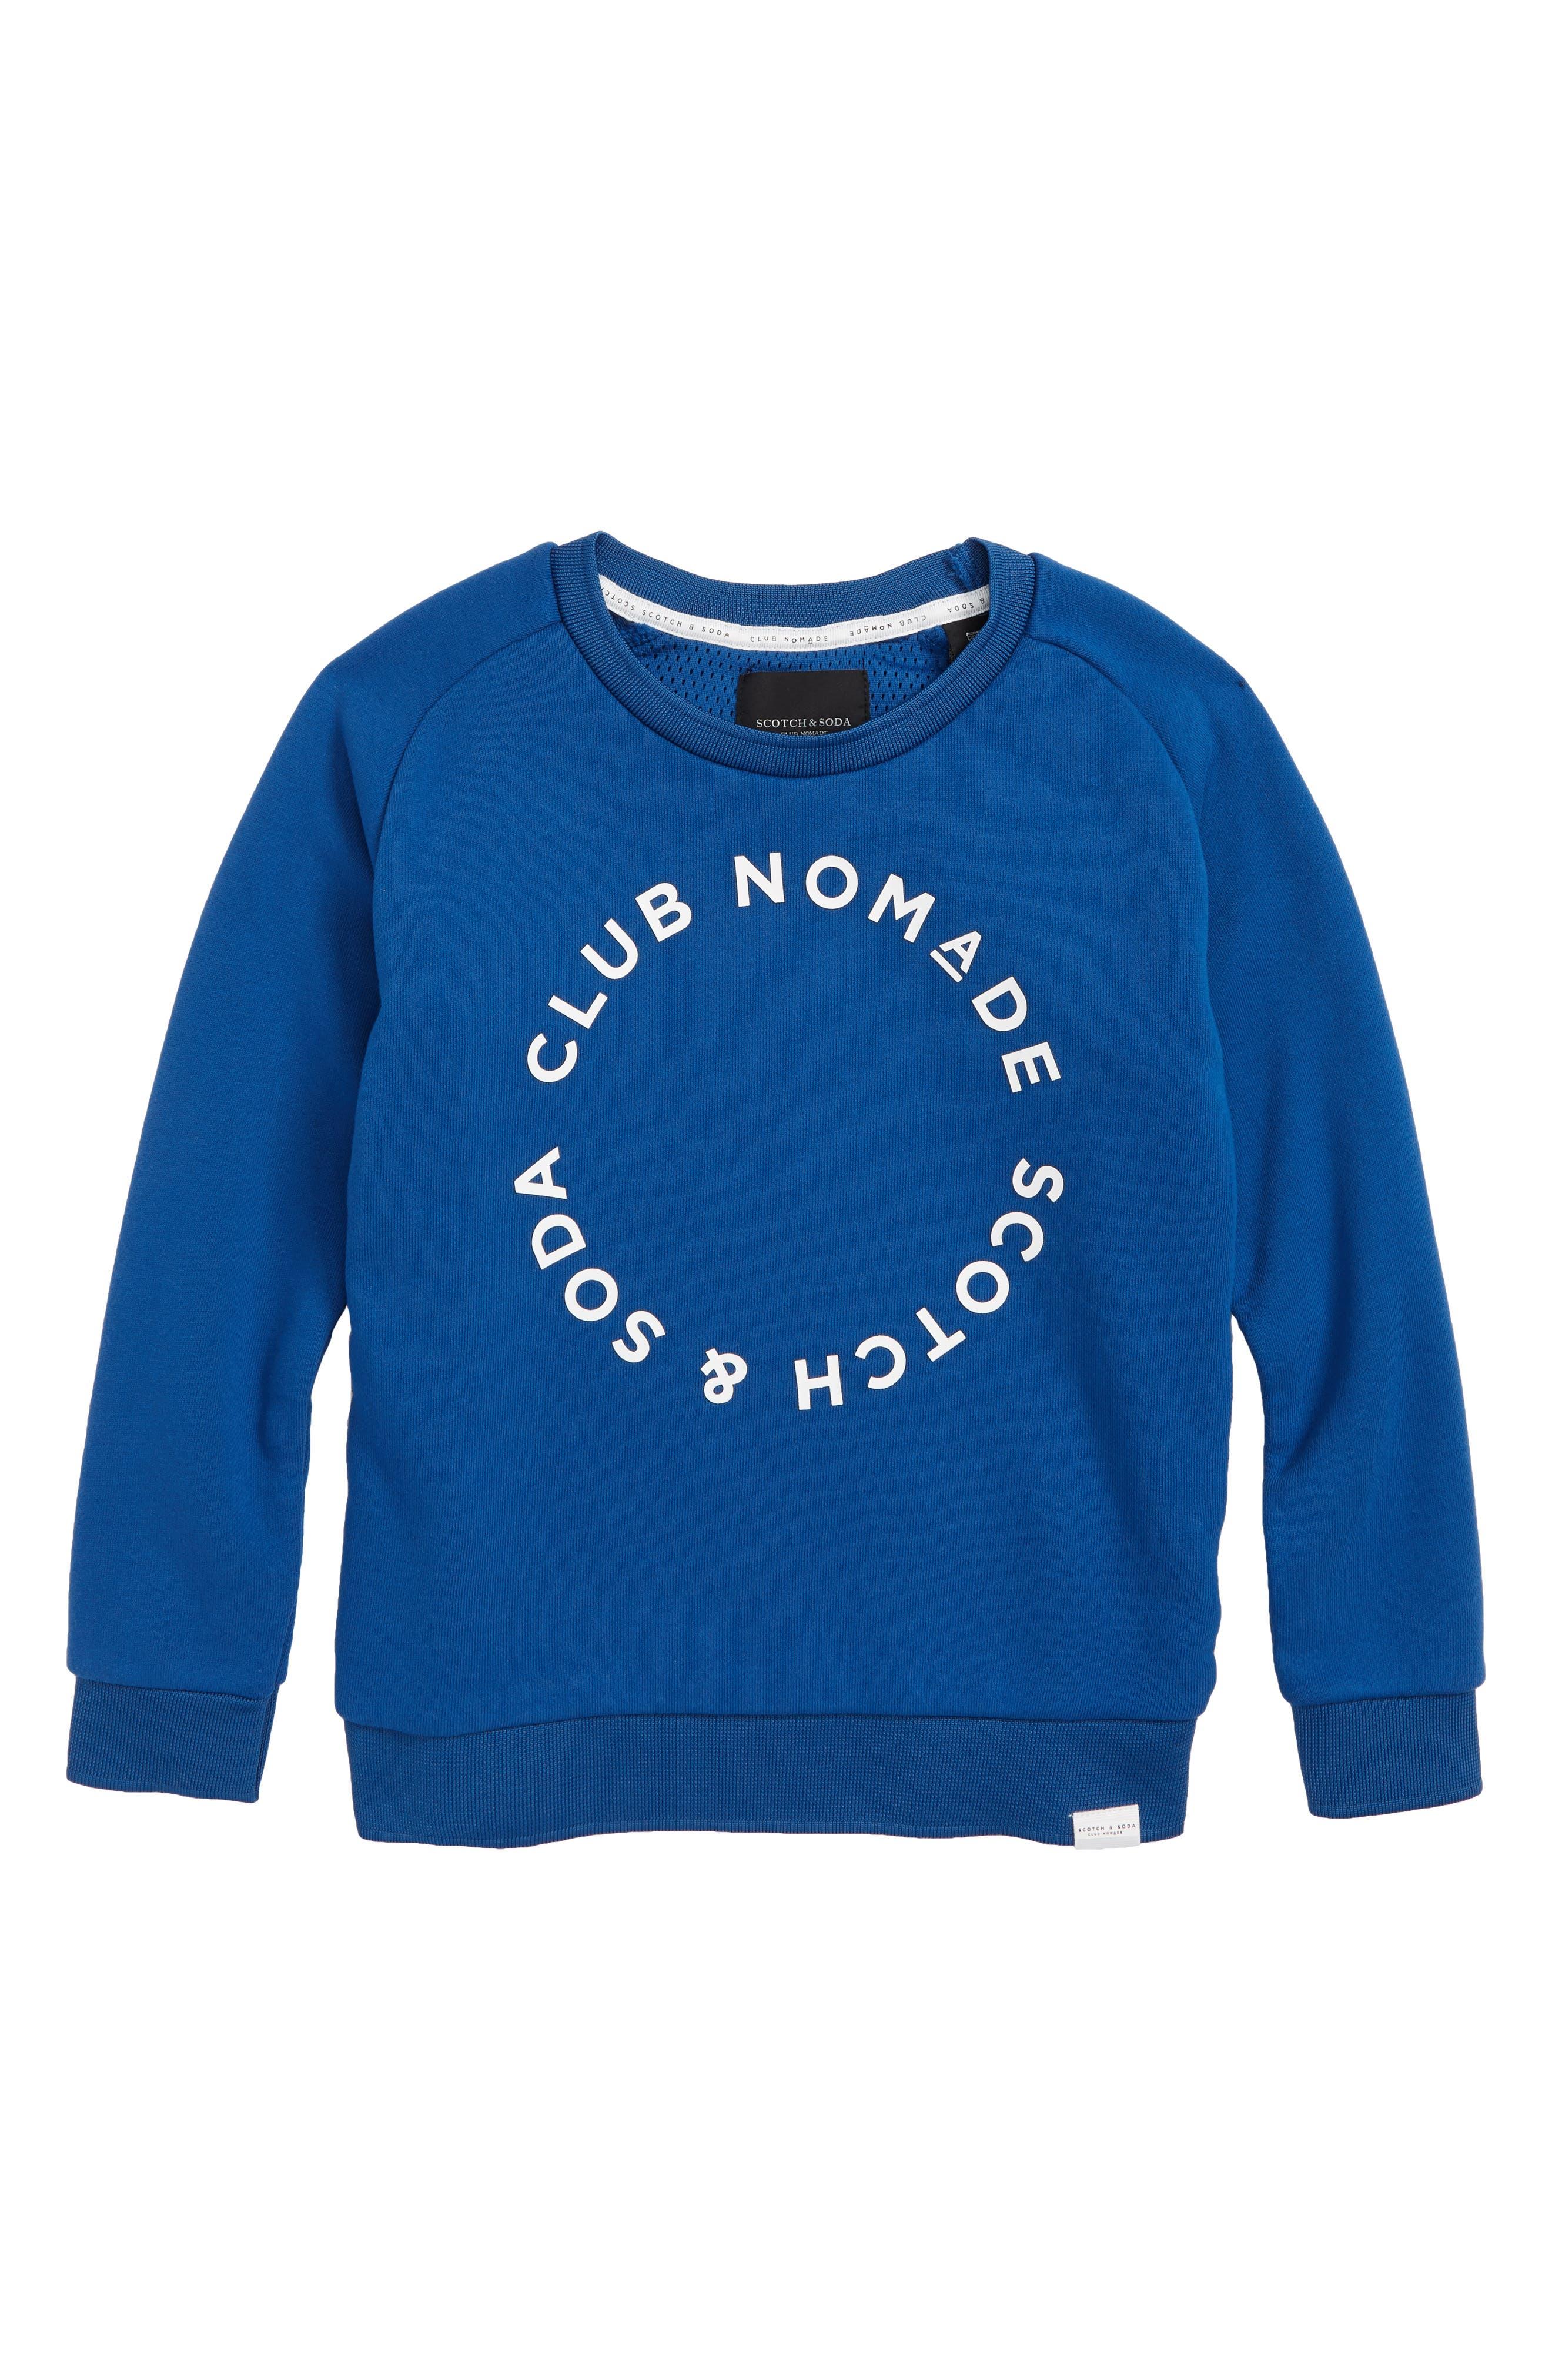 Club Nomad Sweatshirt,                         Main,                         color, 400